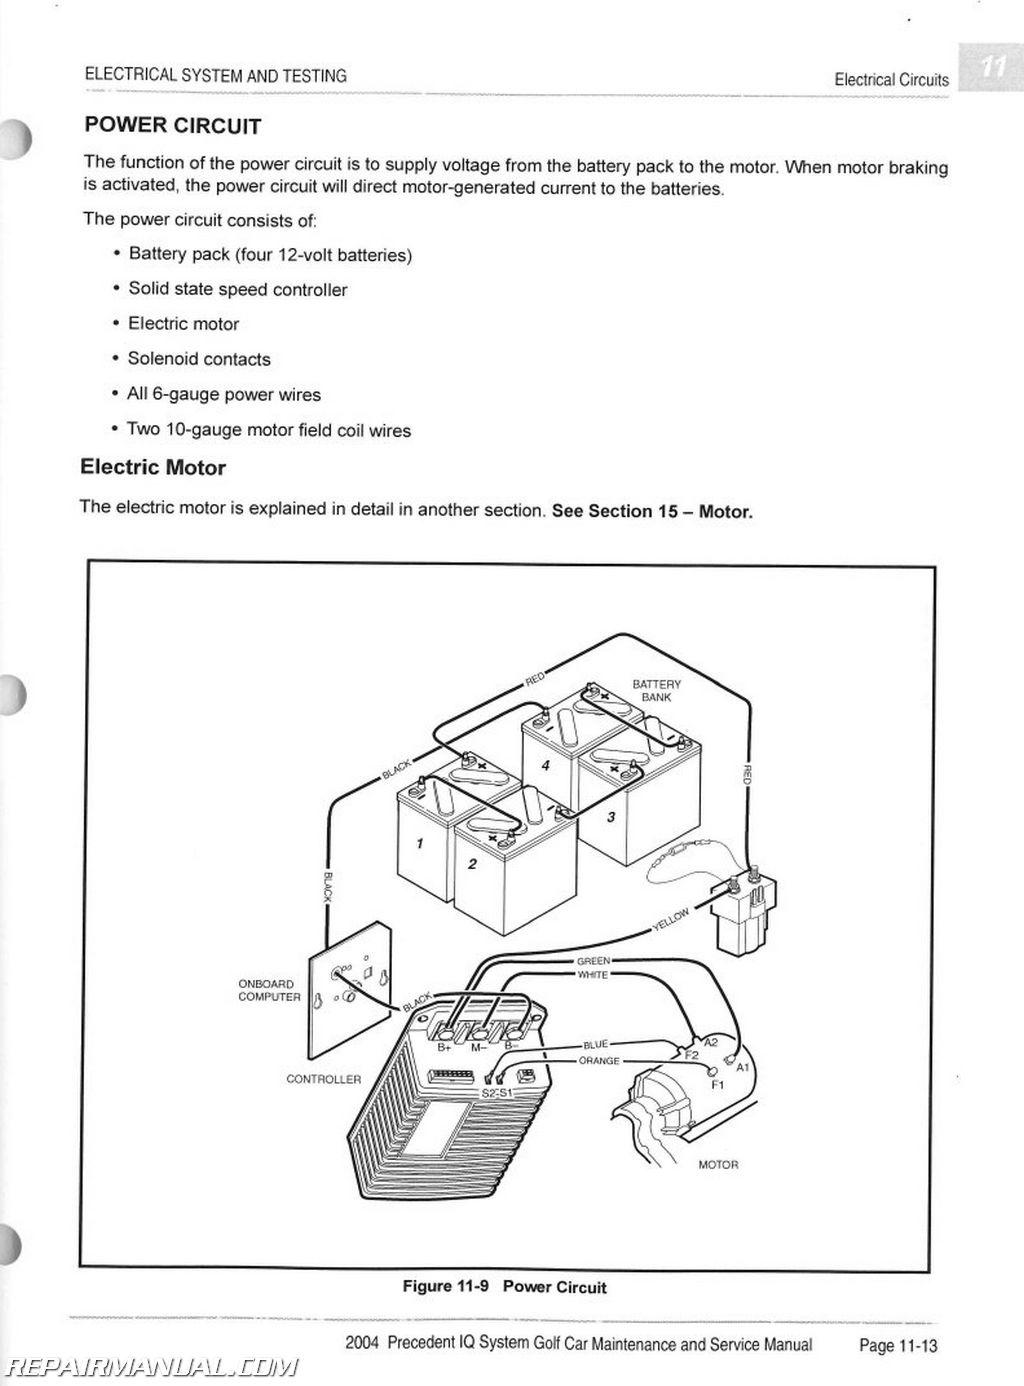 wiring diagram for 48 volt 2007 club car ds golf cart 36